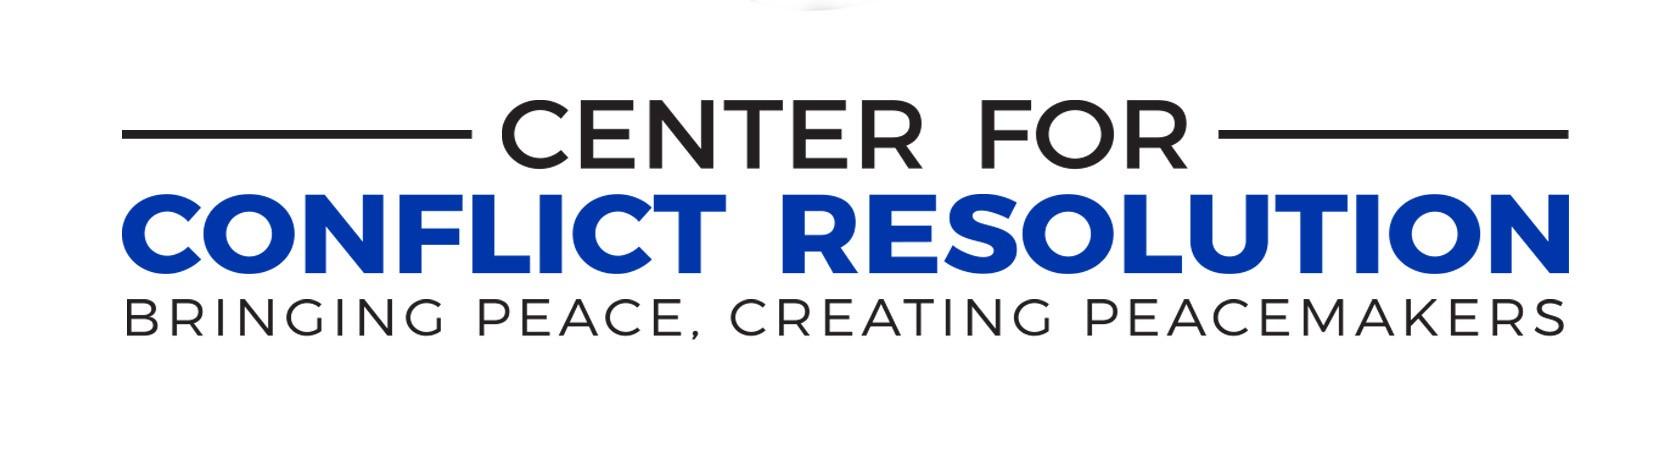 Center For Conflict Resolution   LinkedIn